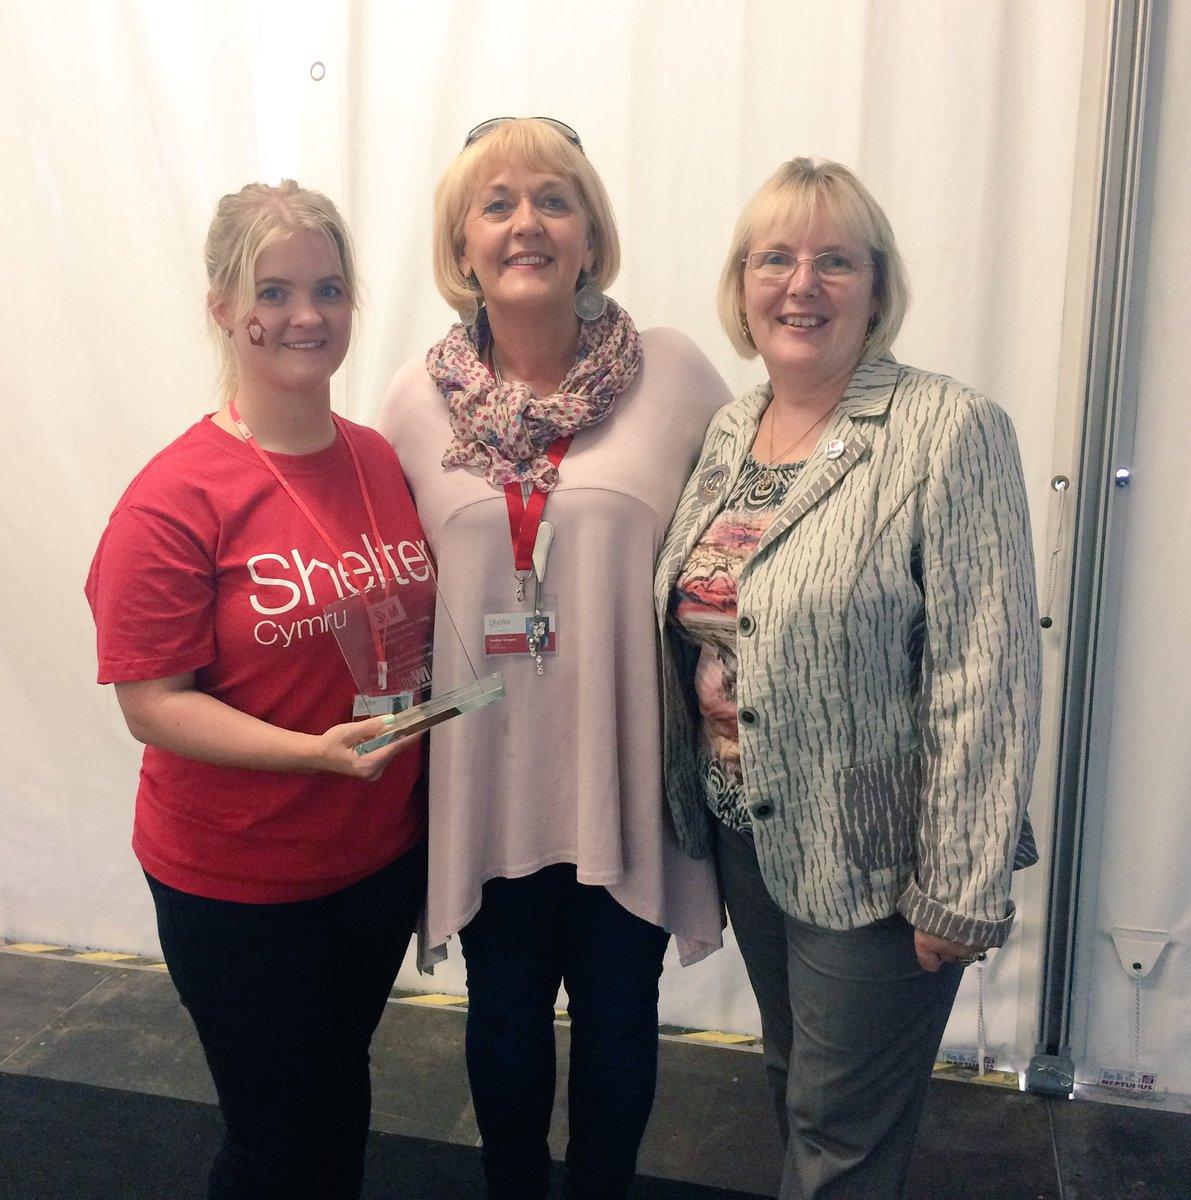 A great privilege to win 2nd prize at @eisteddfod for best stand. Mae'n fraint ennill yr ail wobr am y stondin orau. https://t.co/stQl7V7vvF